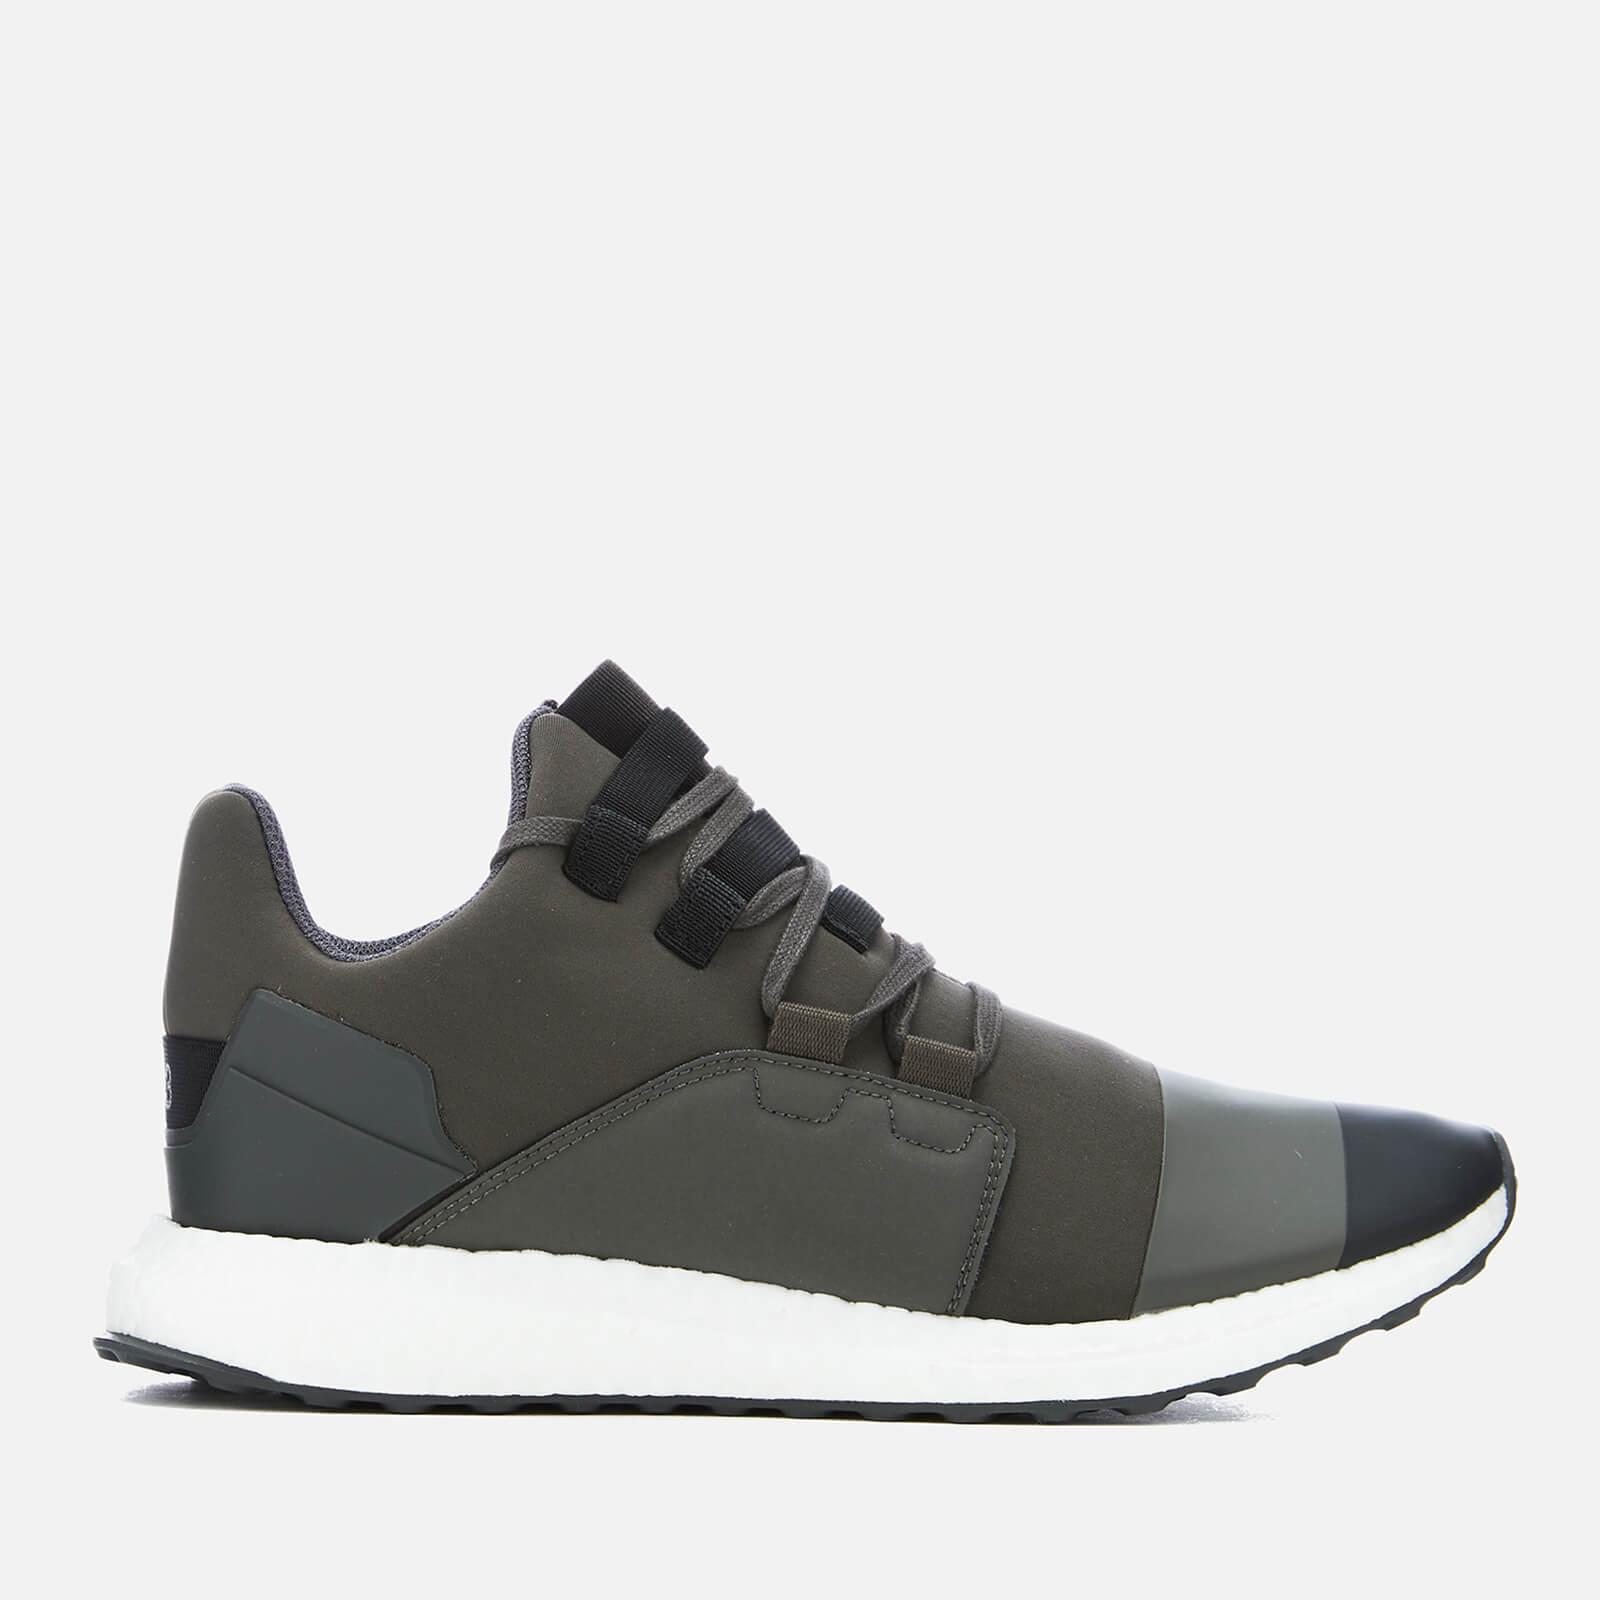 58b53b4ca Y-3 Men s Kozoko Low Sneakers - Y-3 Black Olive Core Black - Free UK  Delivery over £50